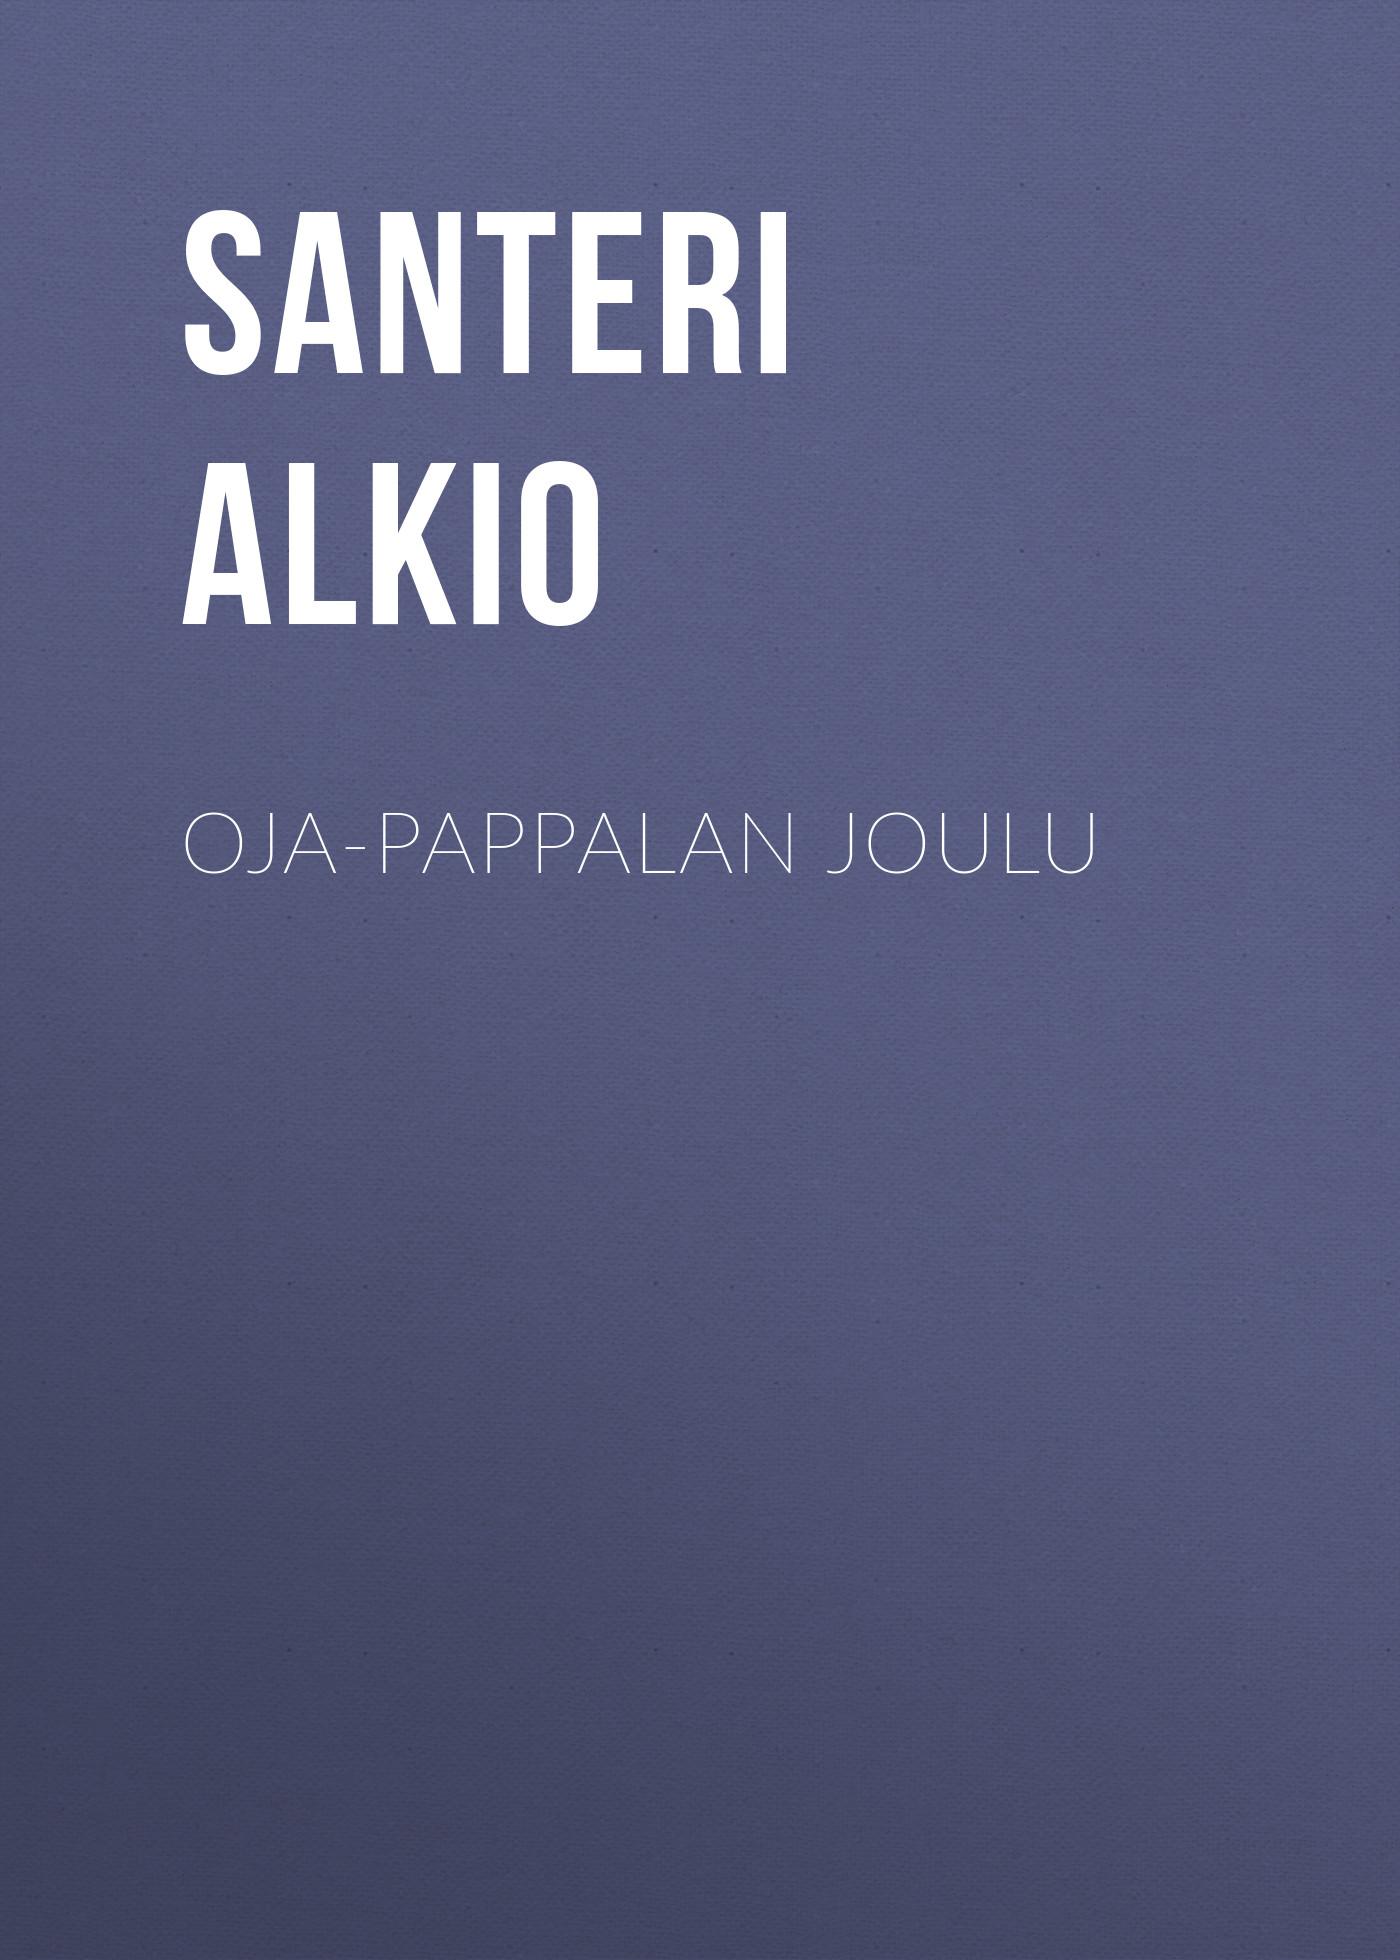 Alkio Santeri Oja-Pappalan joulu oja